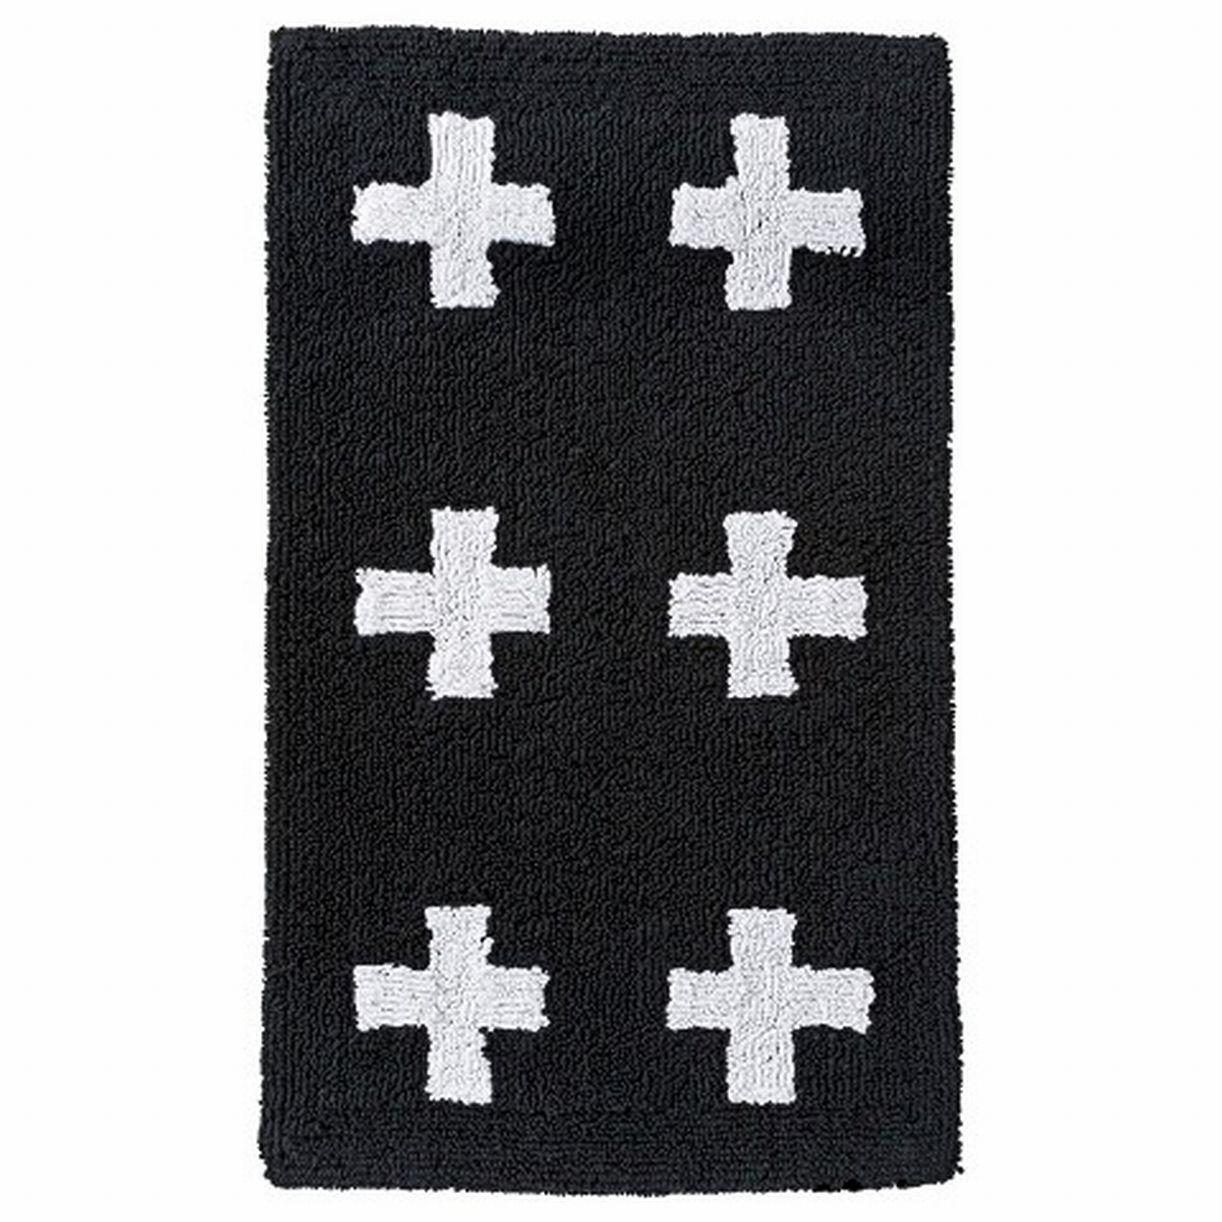 Room Essentials Cotton Bath Rug Black White Cross Accent Mat 20x34